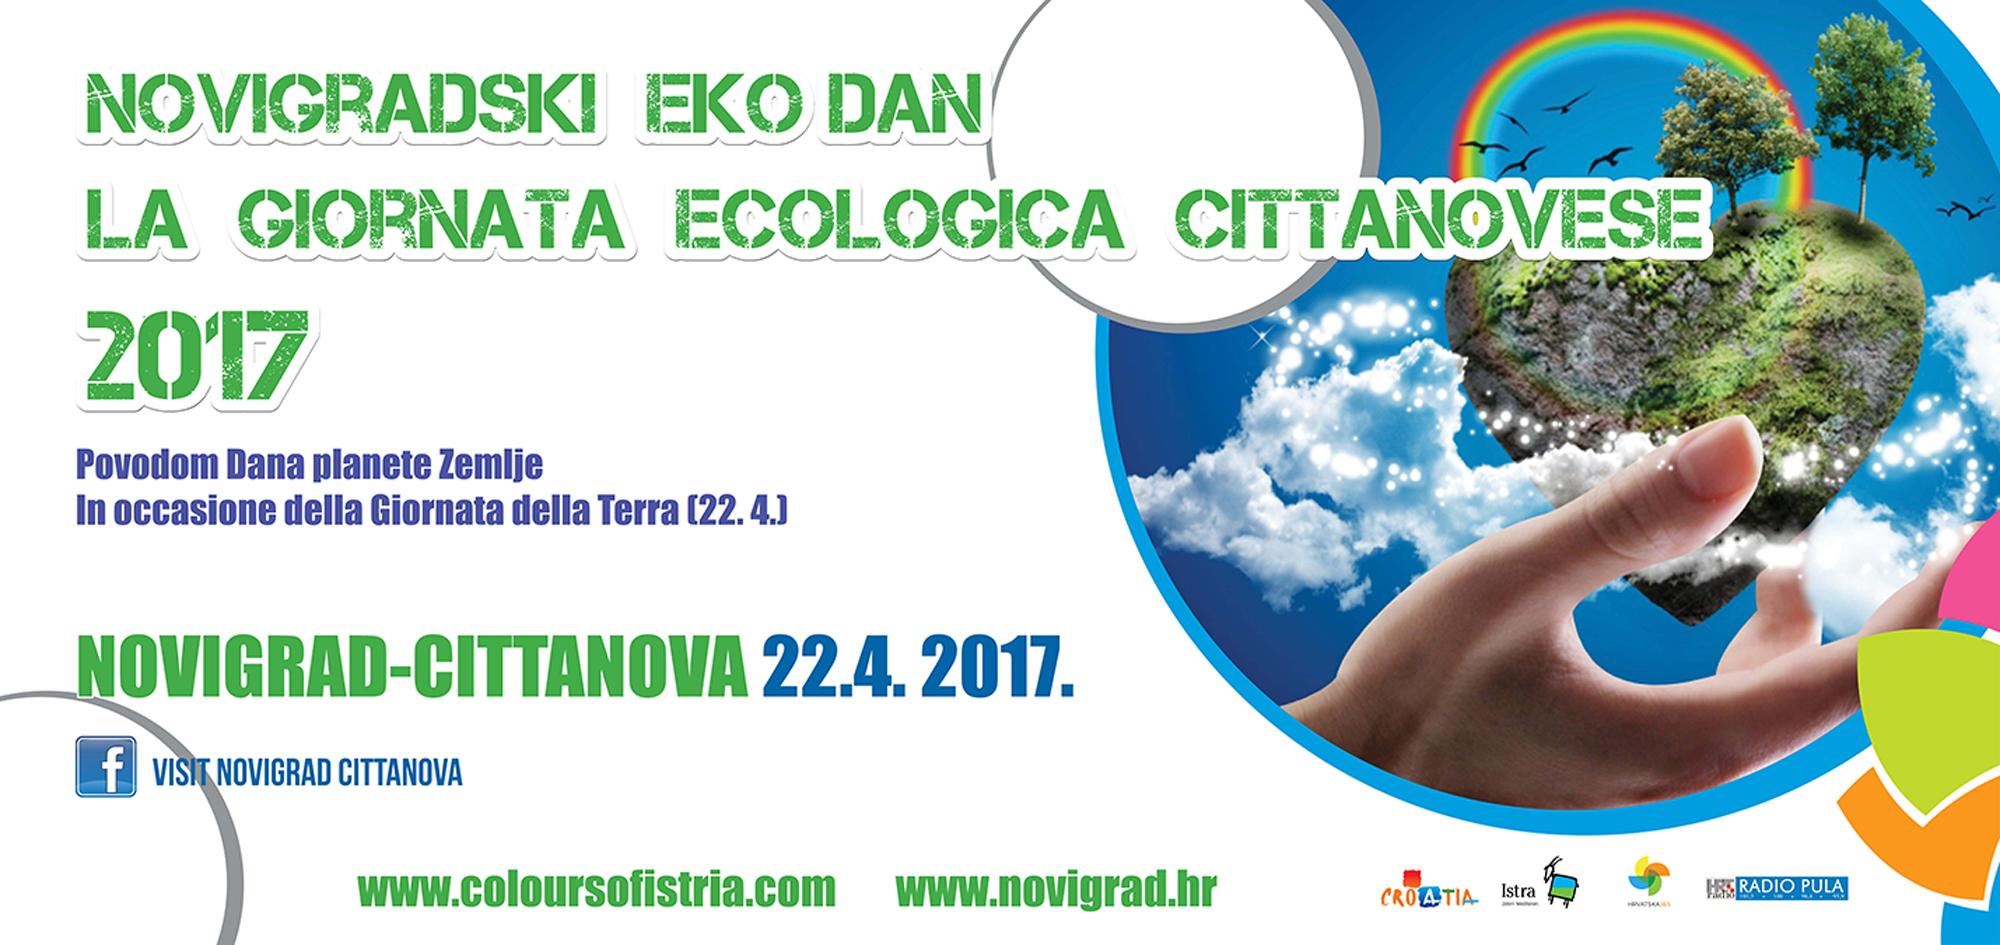 http://www.novigrad.hr/novigradski_eko_dan_2017